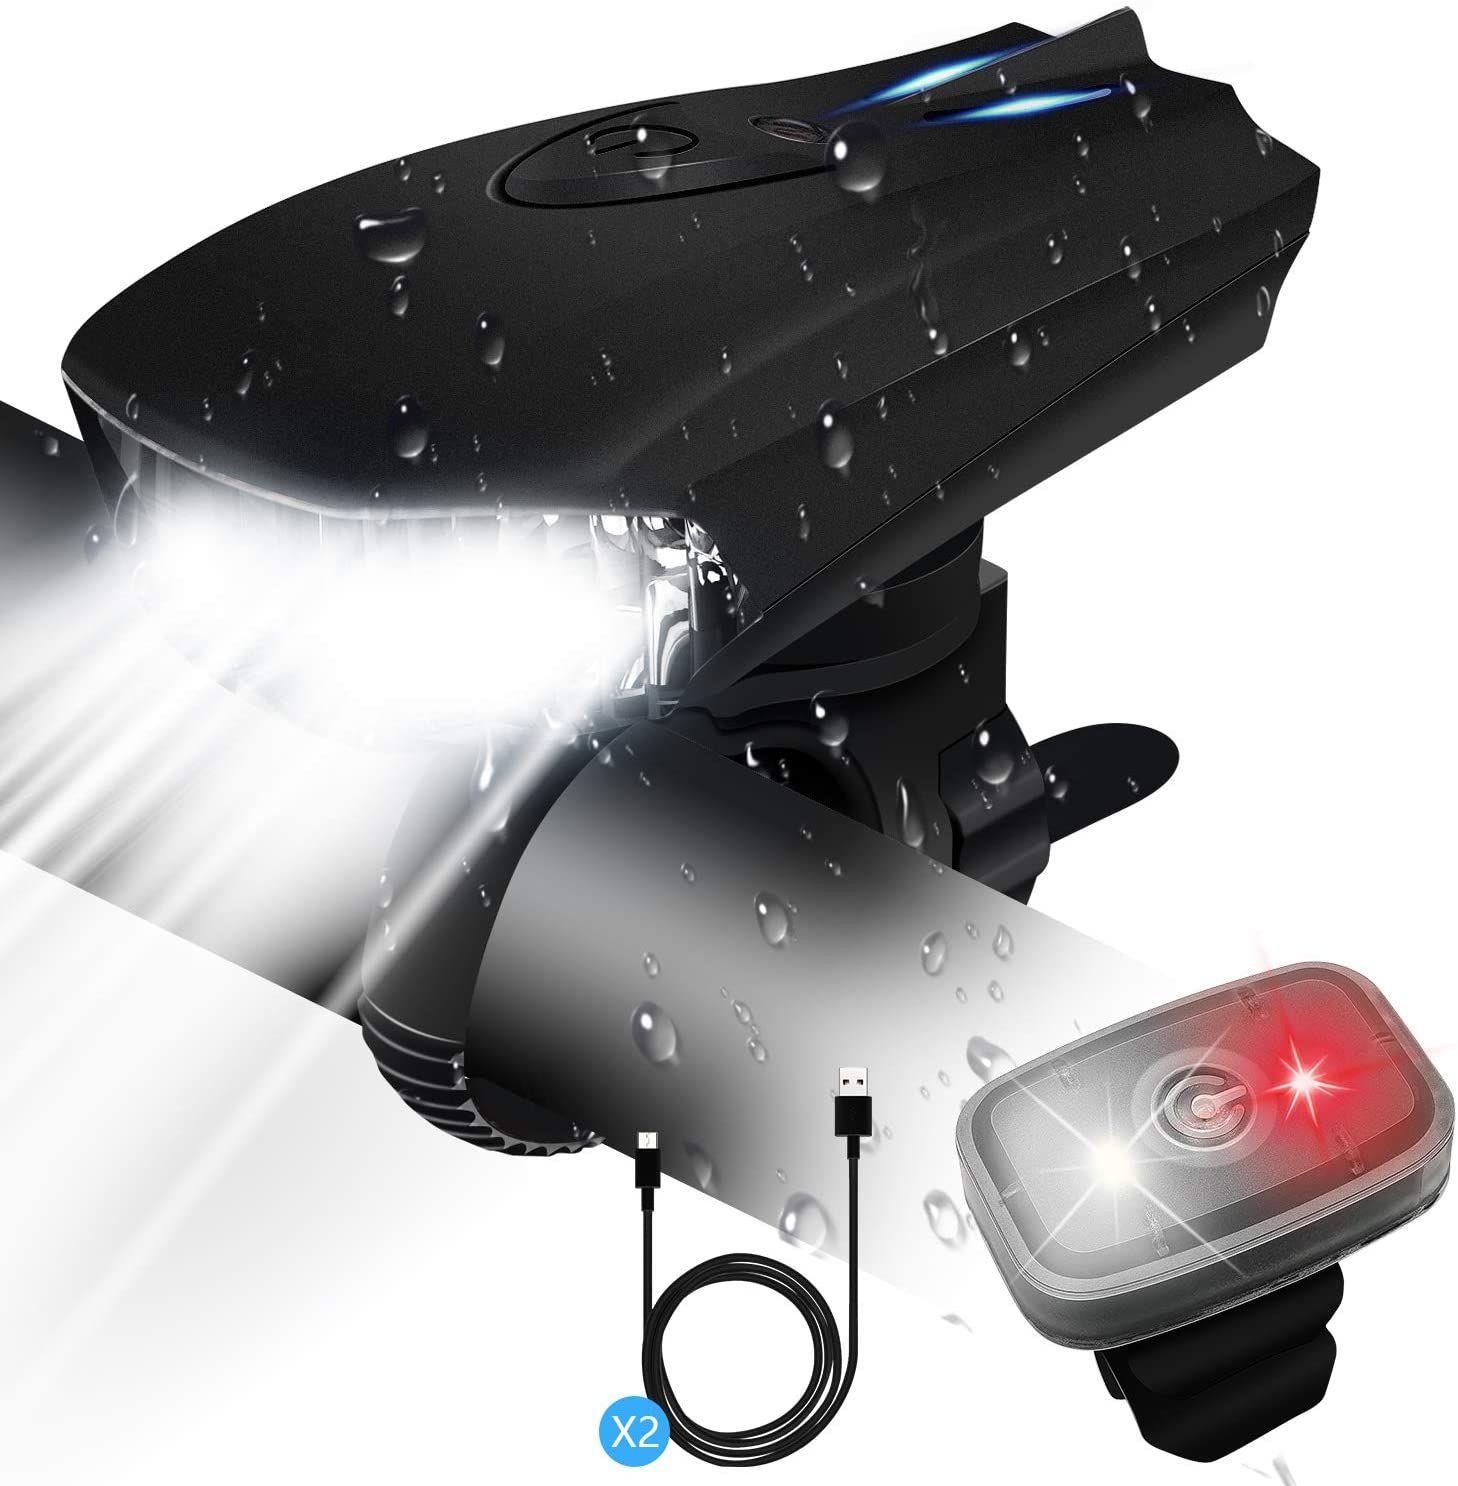 luces bicicleta delantera y trasera con 5 Modos recargable